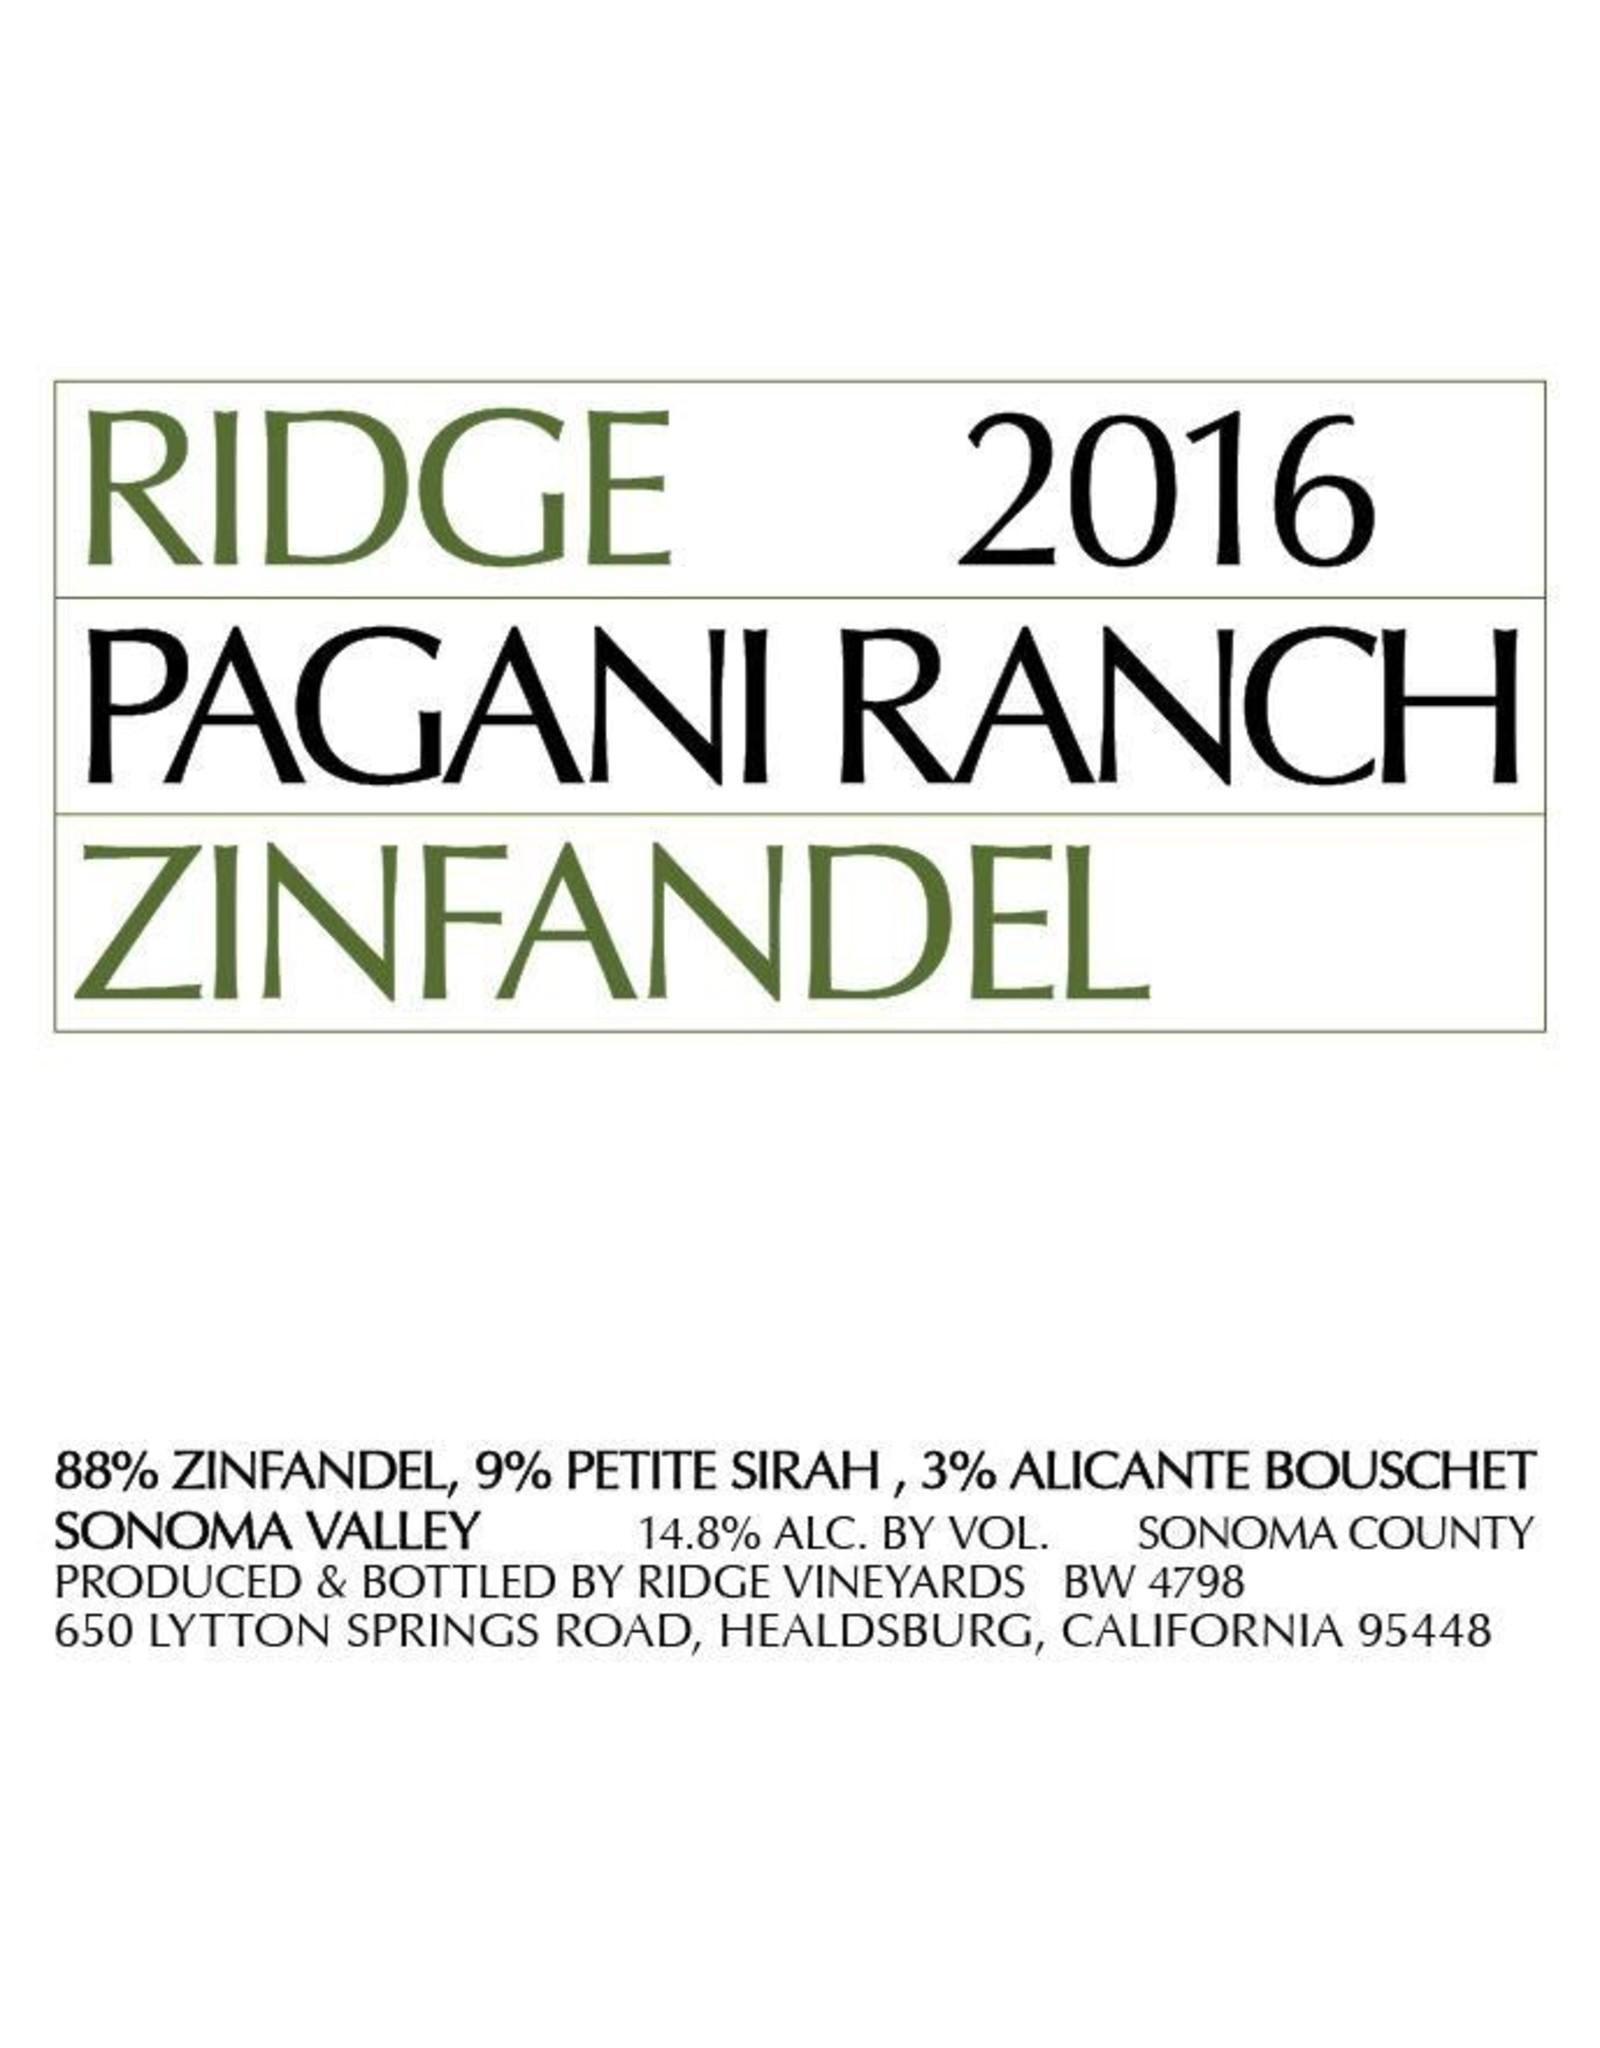 Ridge Vineyards Ridge Zinfandel 'Pagani Ranch' (2016)